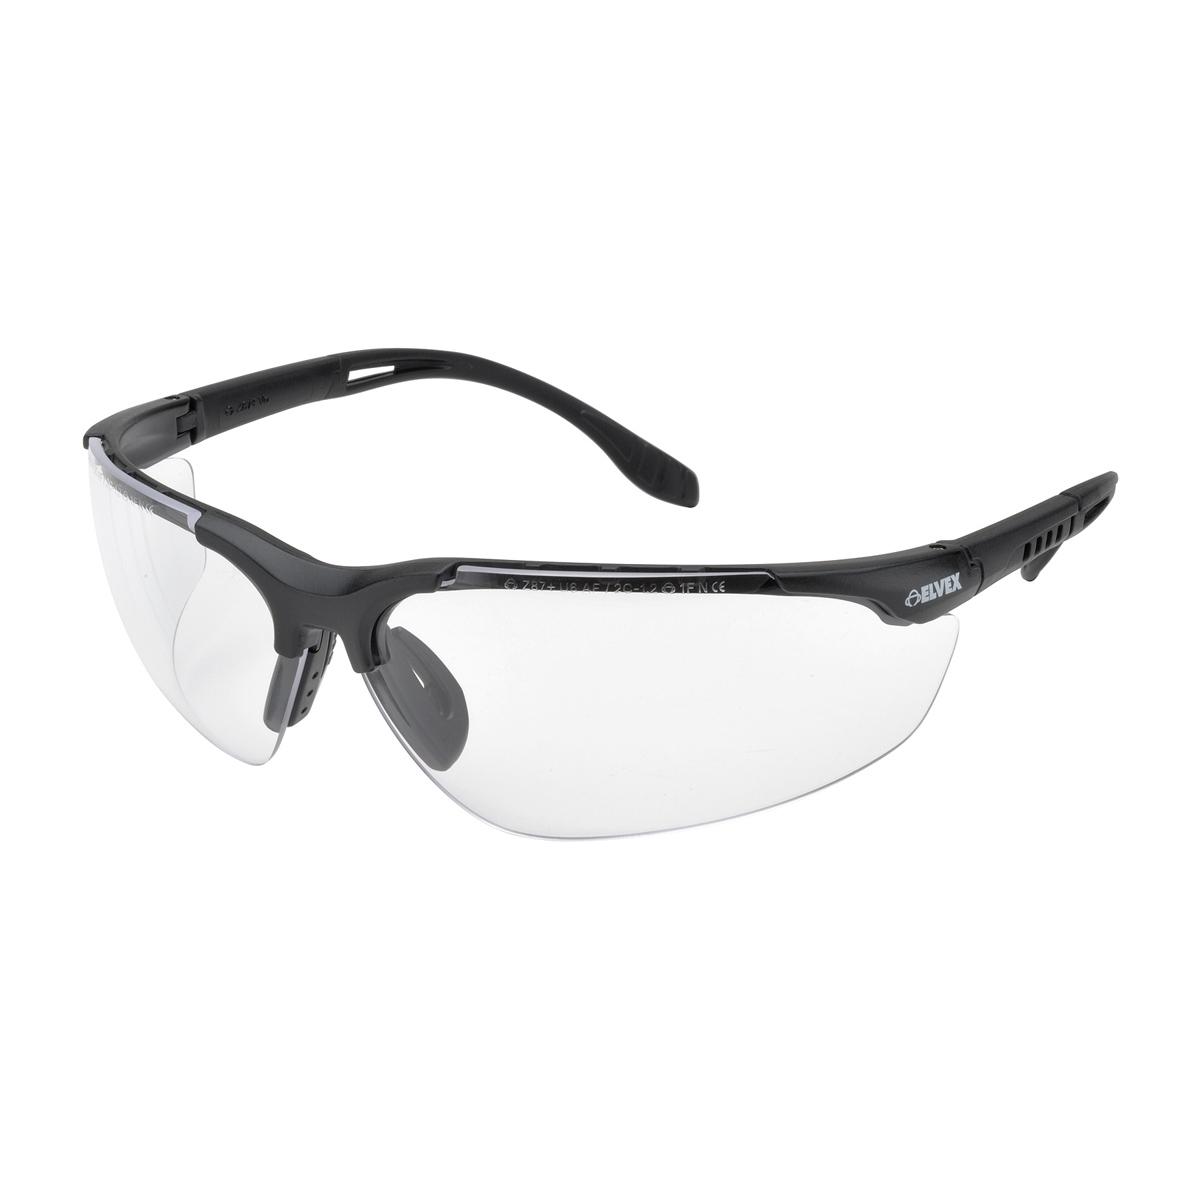 Black Frame Glasses Singapore : Elvex SG-51C Sphere-X Ultimate Safety Glasses - Black ...